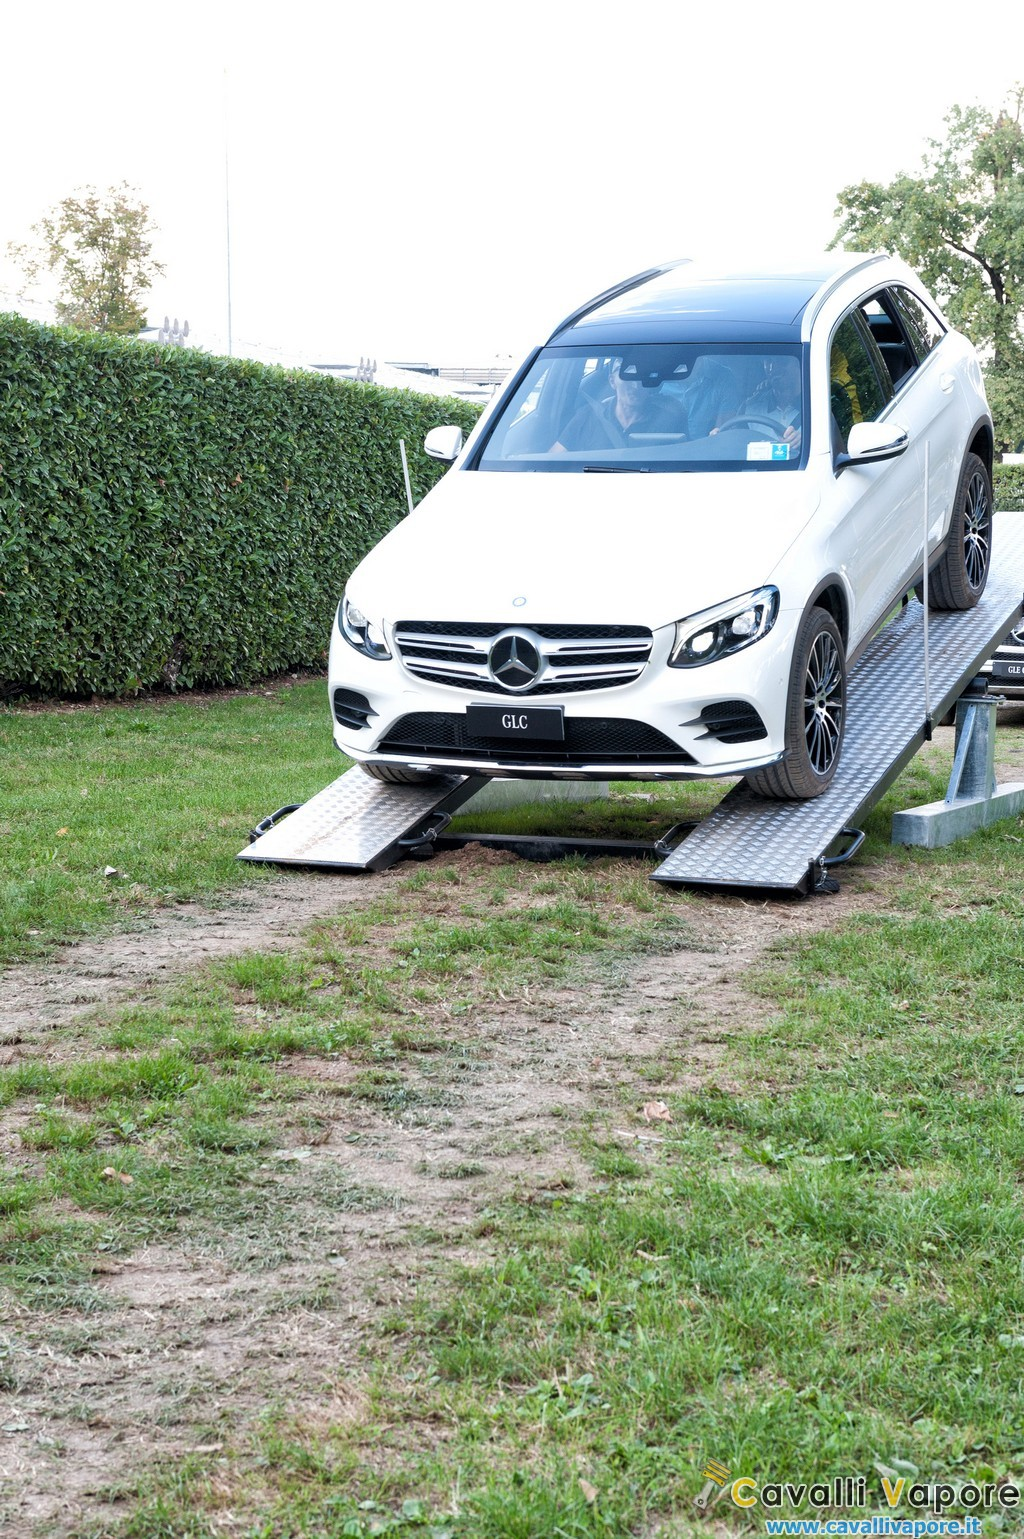 SUV Mercedes GLC Parco di Monza Test Off Road 4